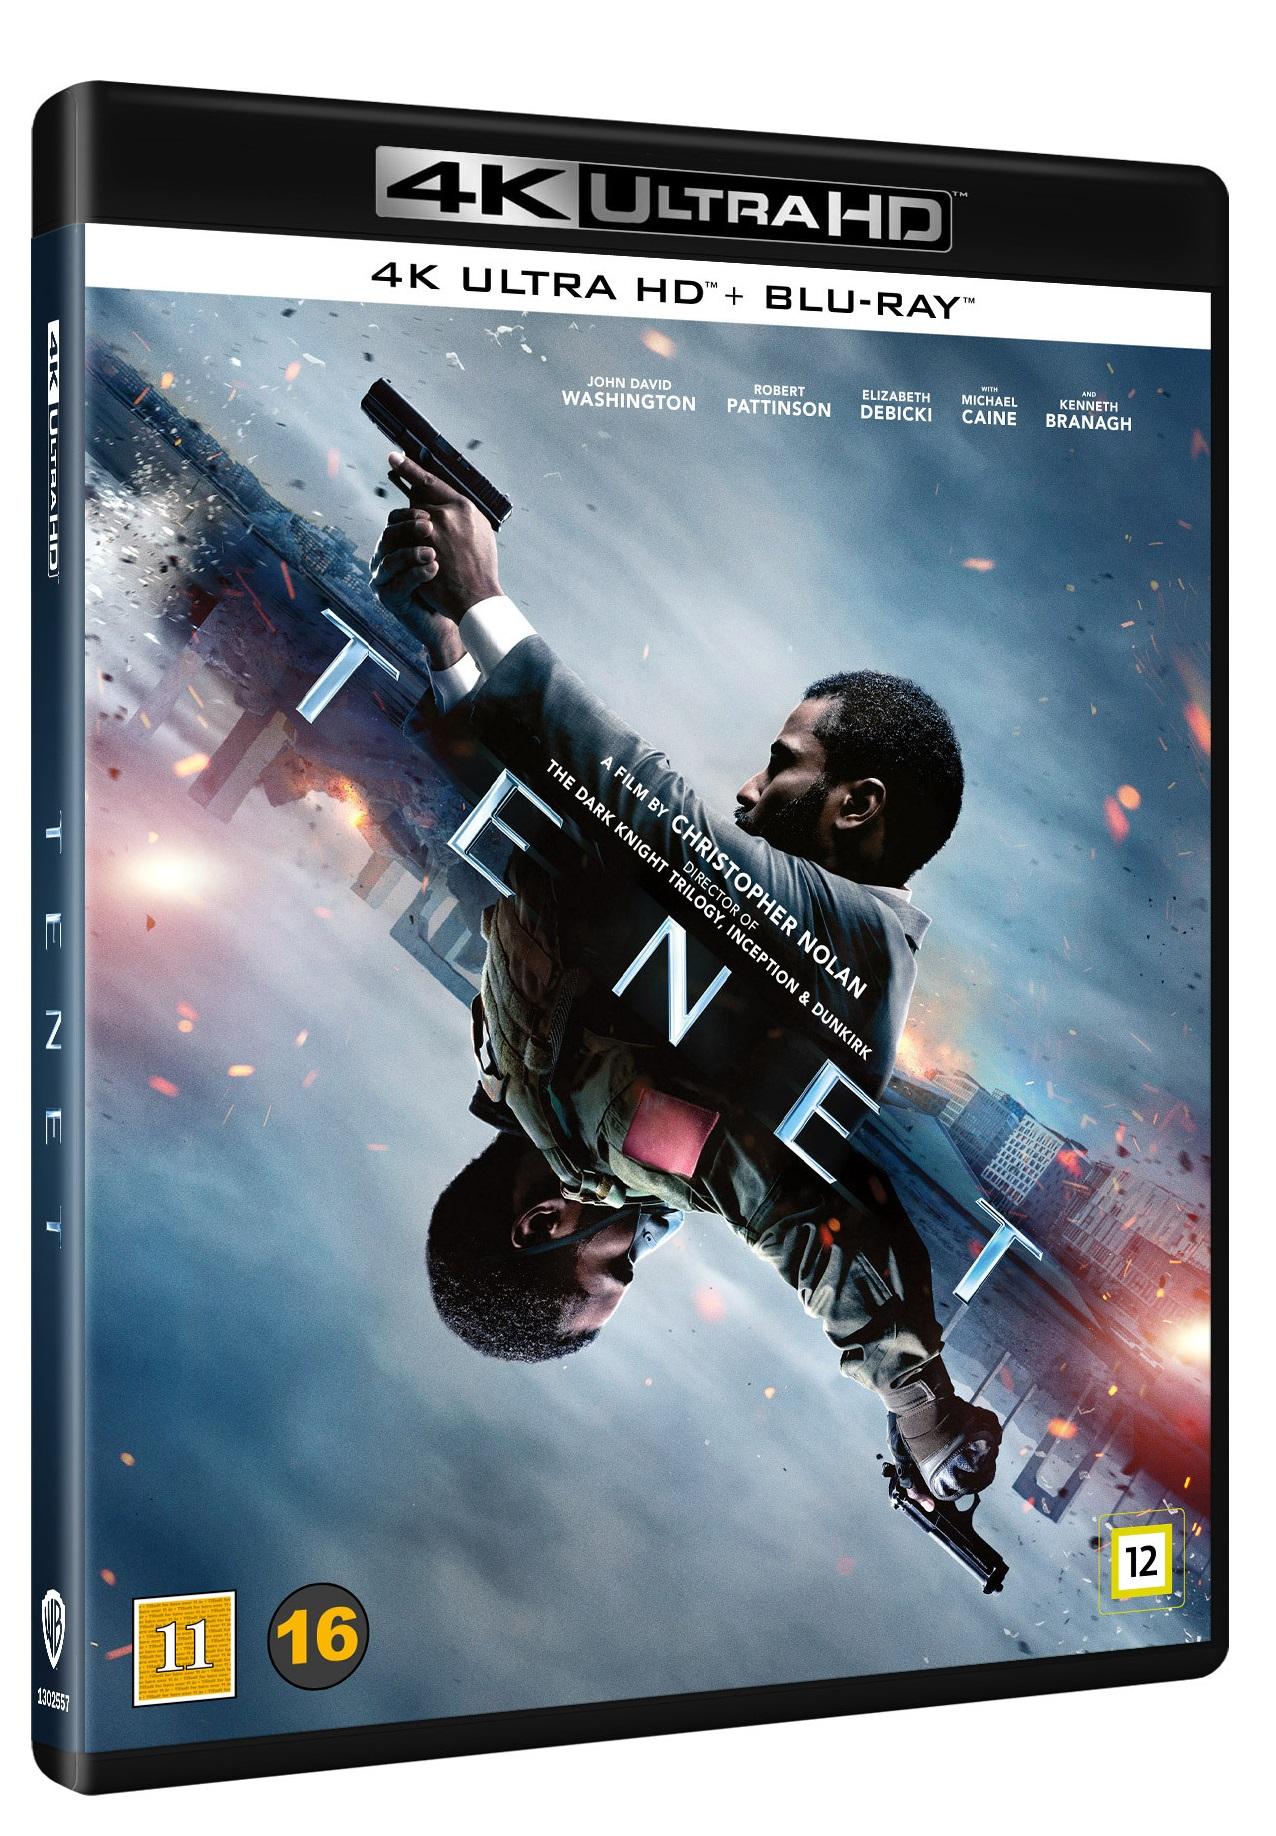 Tenet - Christopher Nolan - Film -  - 7333018017931 - 14. december 2020